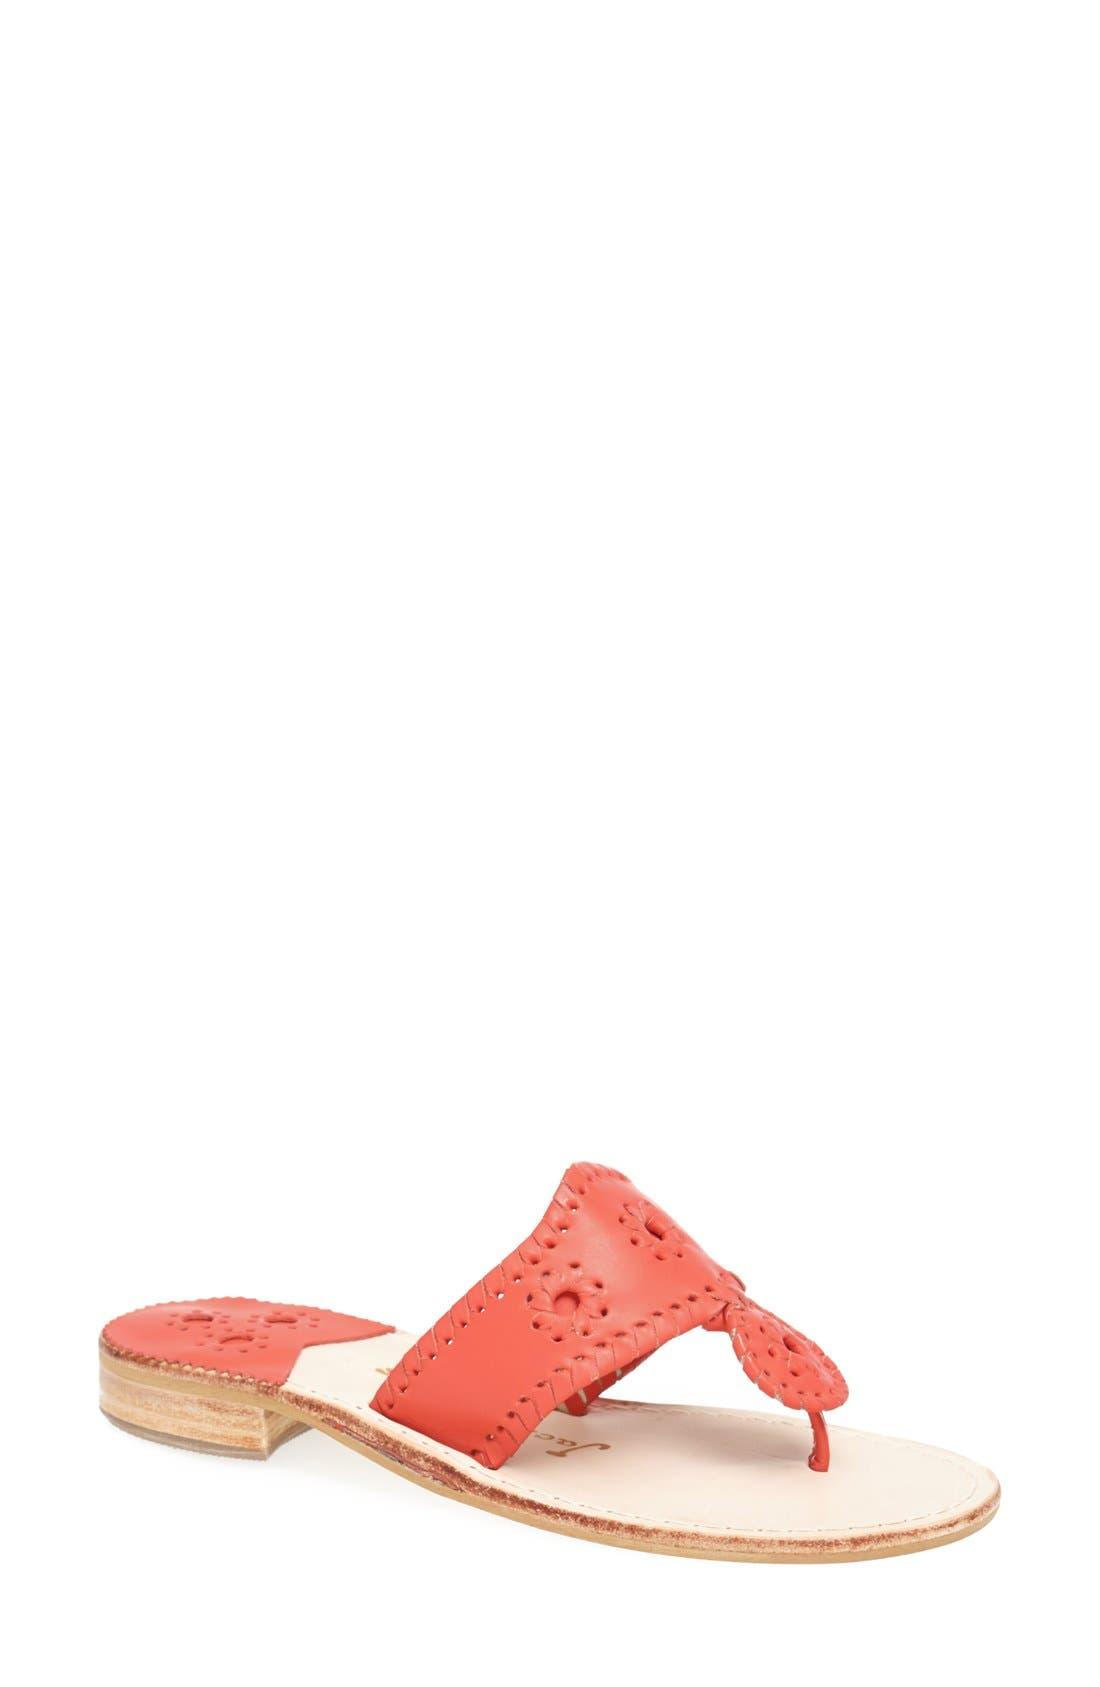 Main Image - Jack Rogers 'Nantucket' Leather Sandal (Women)